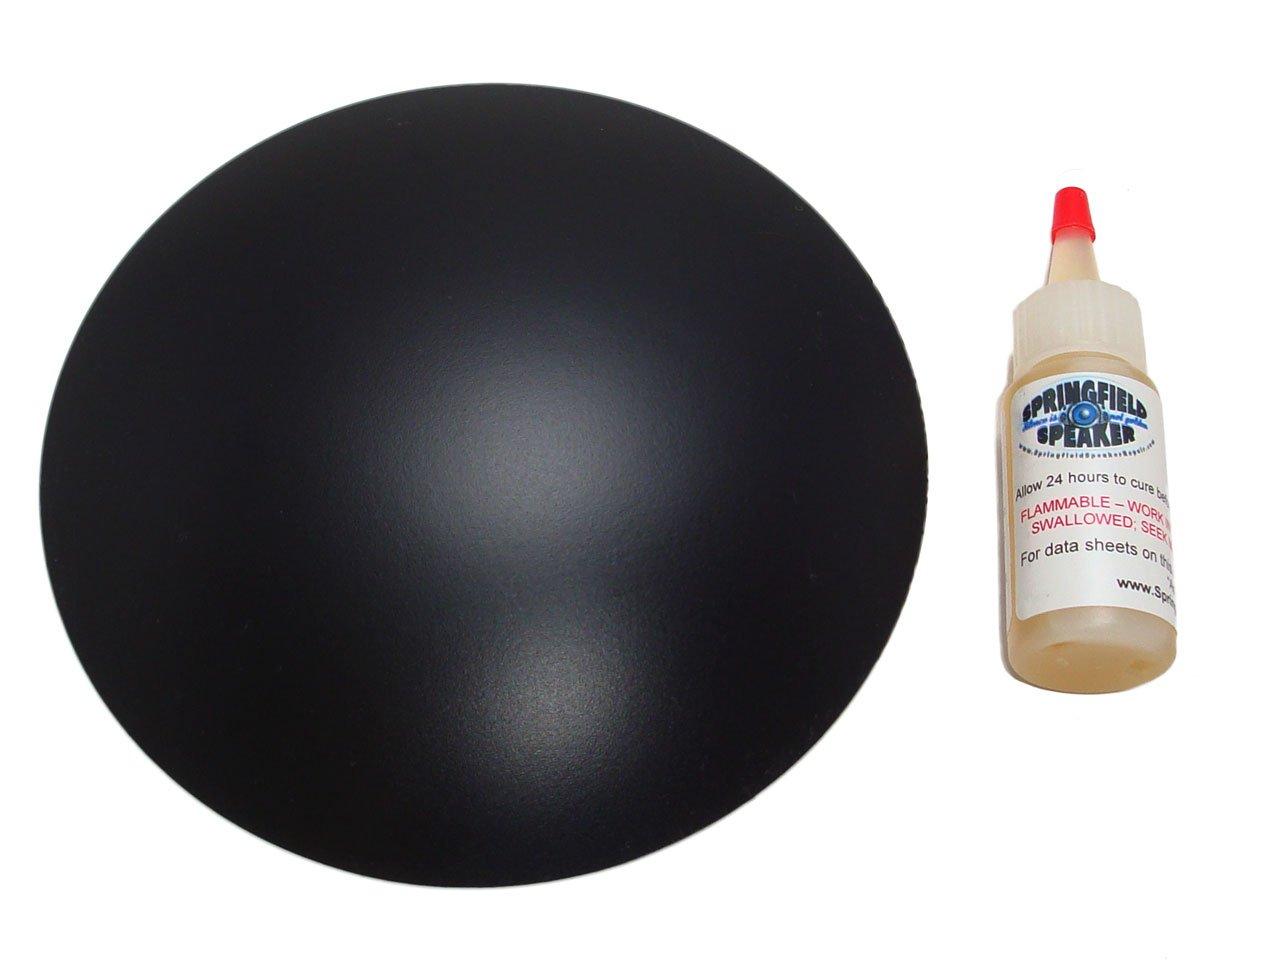 6.5'' Inverted Poly Speaker / Subwoofer Dust Cap Kit